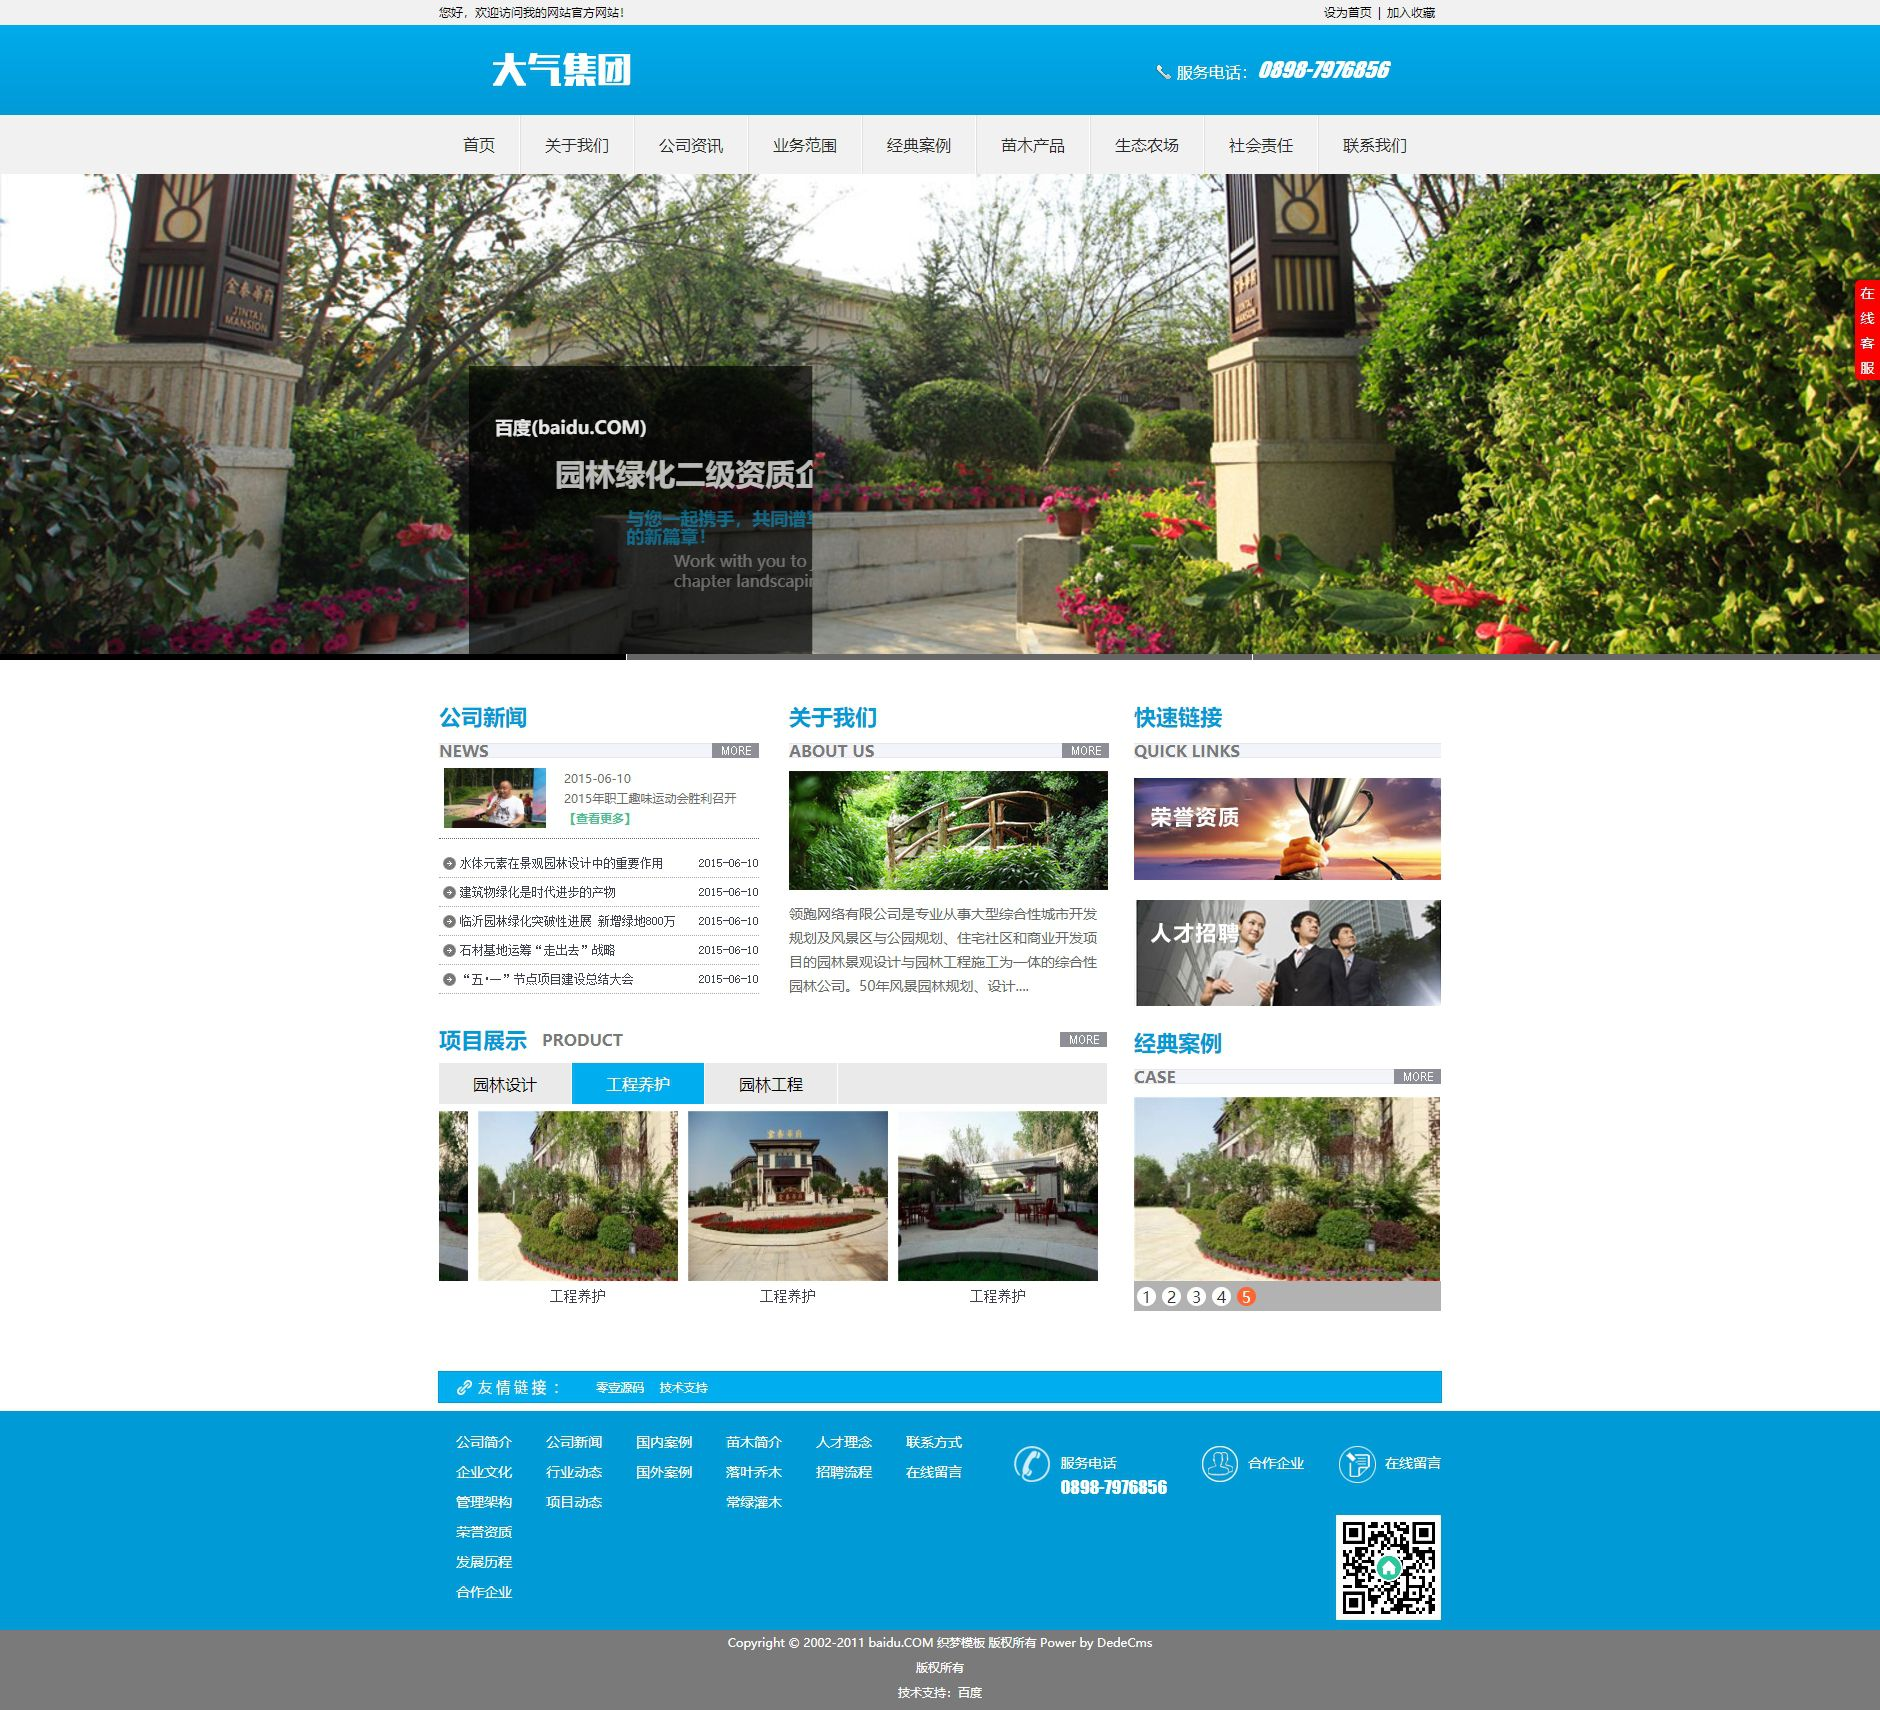 html5高端大气集团企业通用织梦dedecms网站模板